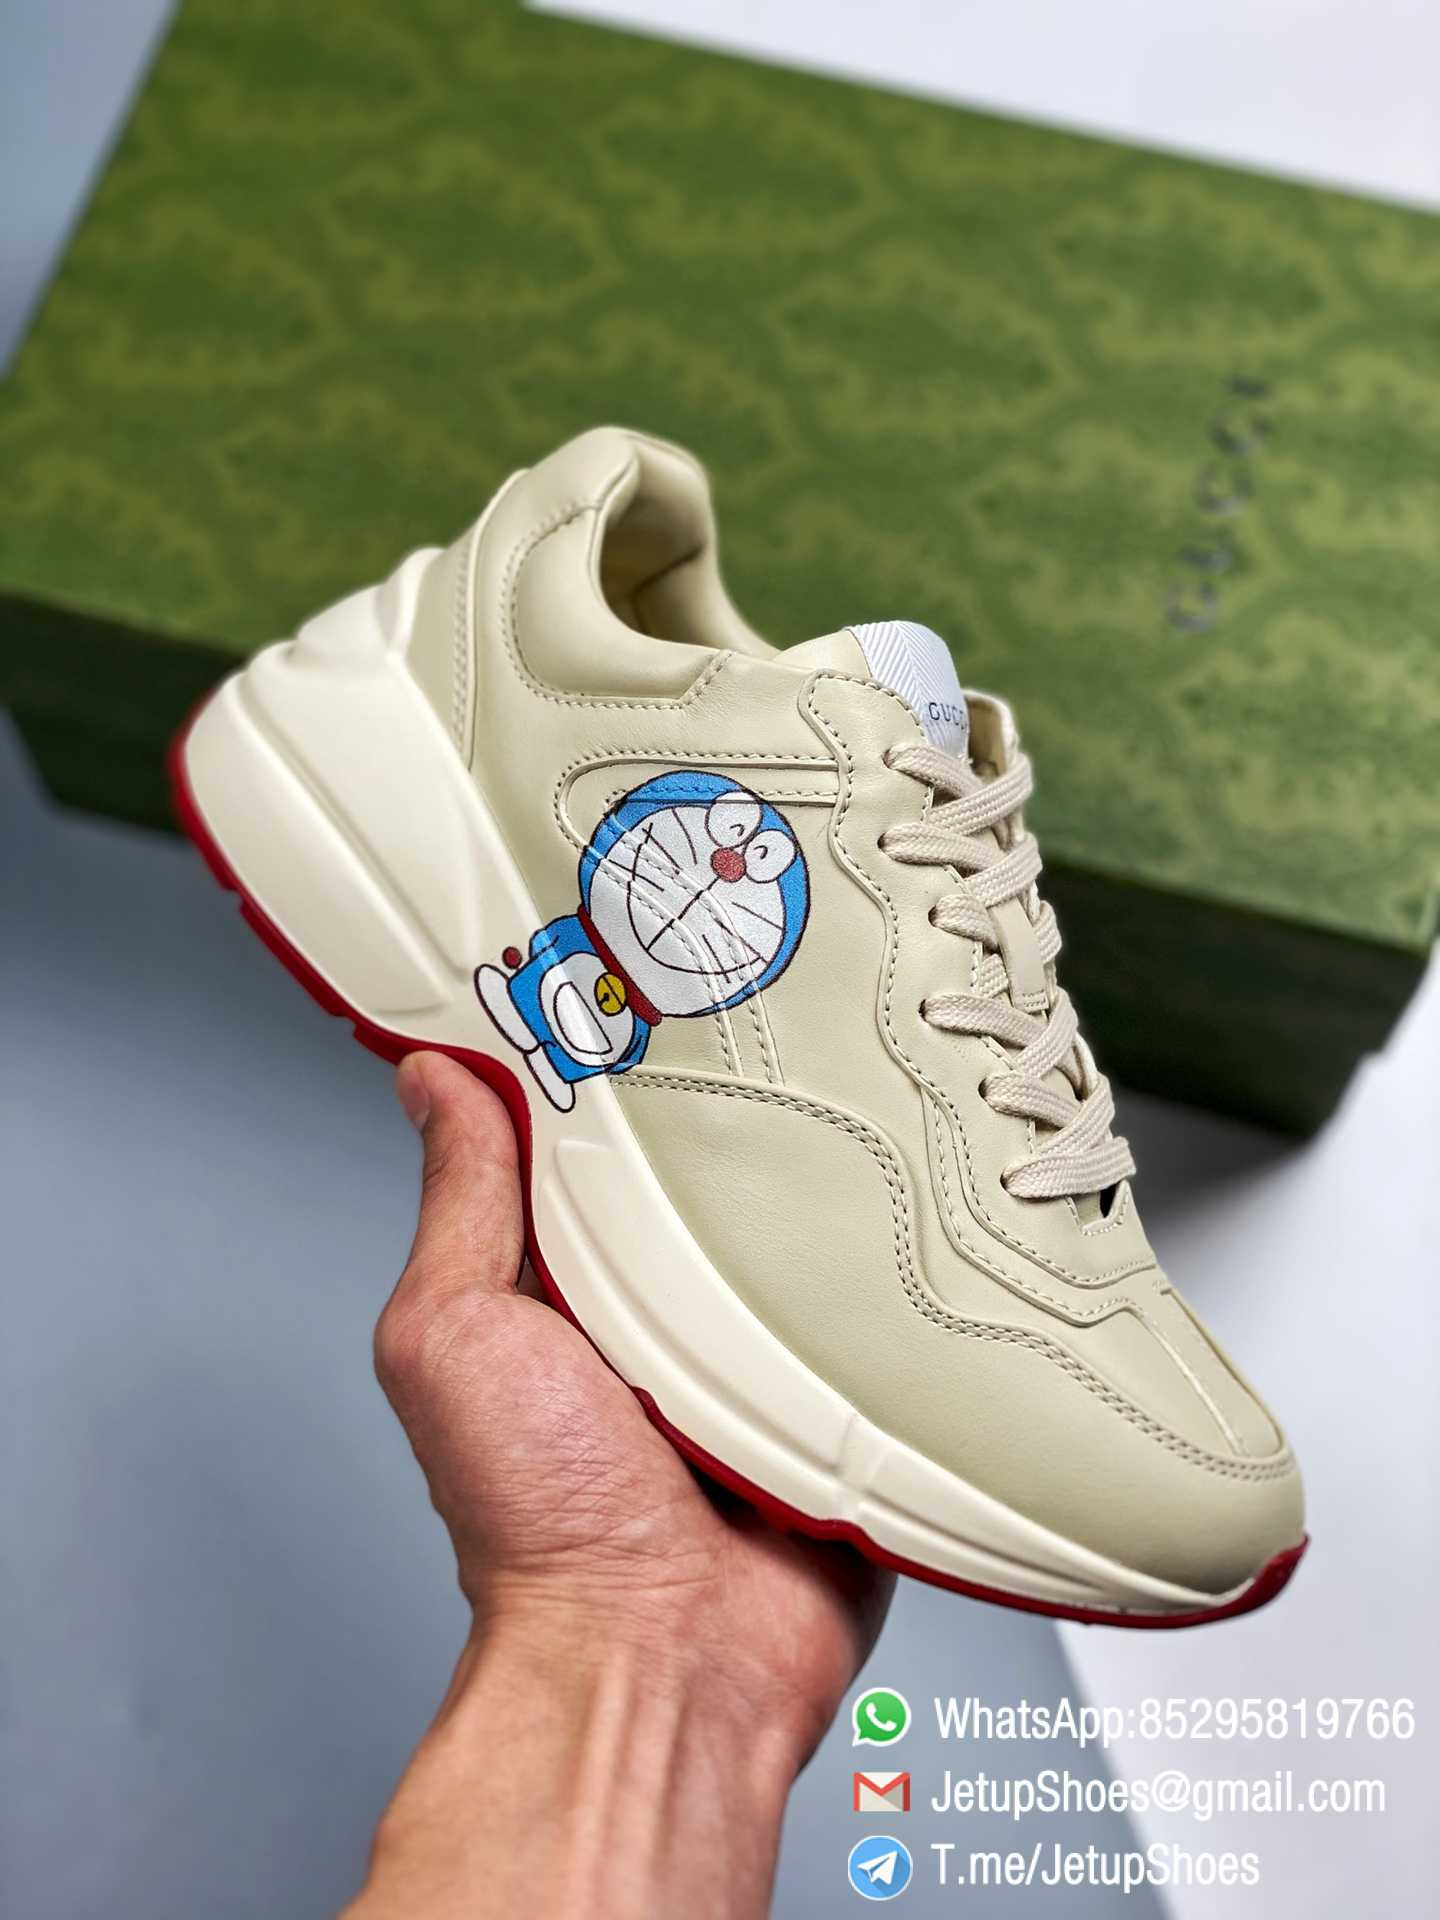 Doraemon x Gucci womens Rhyton Sneaker Special Collaboration Sneakers SKU 655037 DRW00 9522 01